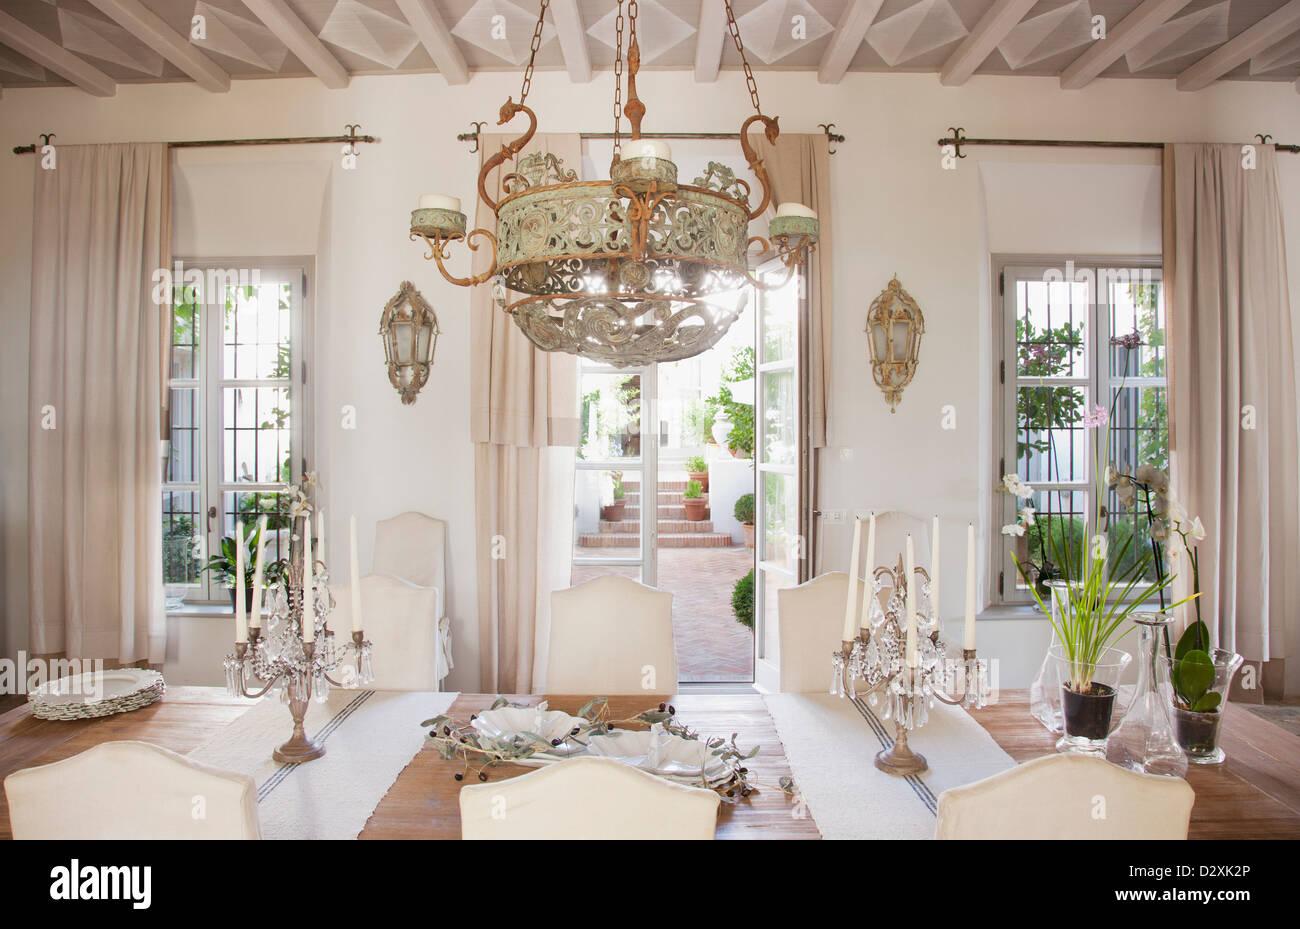 Luxus Esszimmer Stockfoto Bild 53446142 Alamy